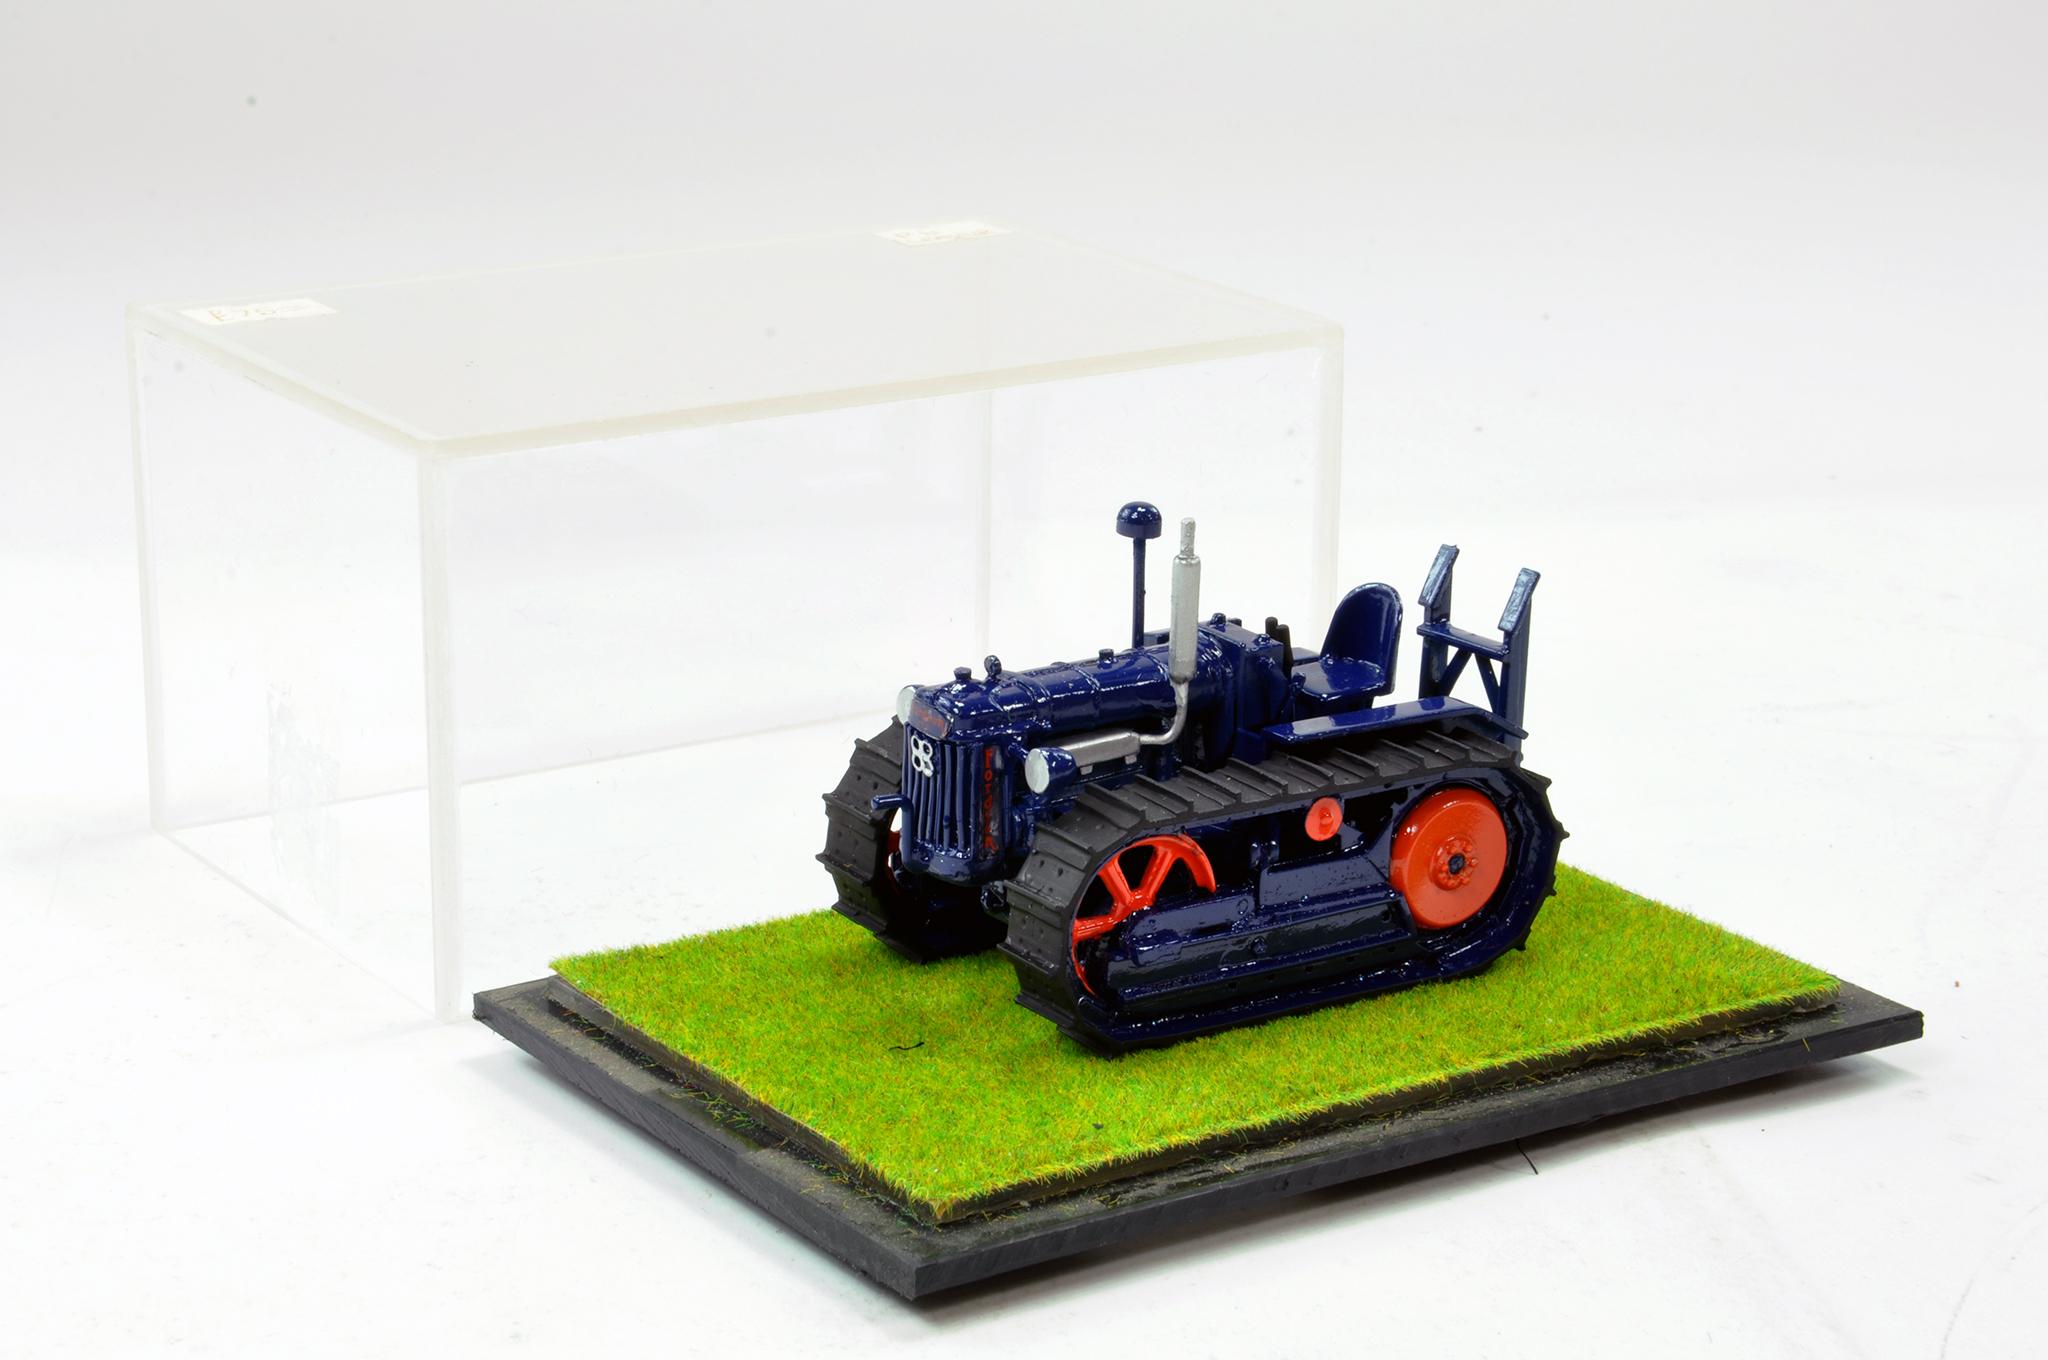 Lot 244 - Scaledown Models 1/32 Hand Built Fordson Major E27N Crawler Tractor. Superb model is generally